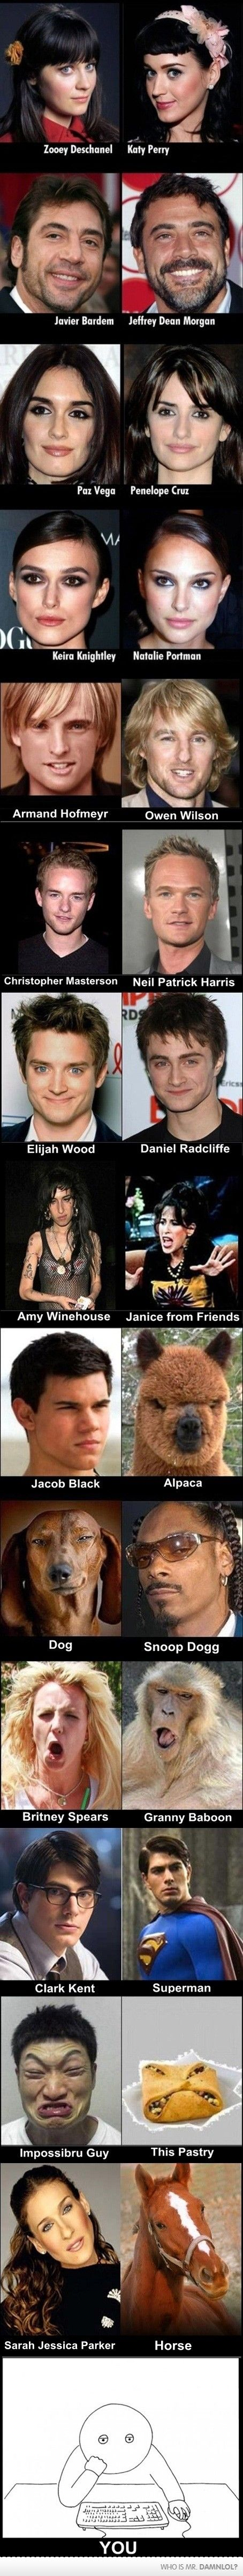 Celebrity look a likes hahahhaha